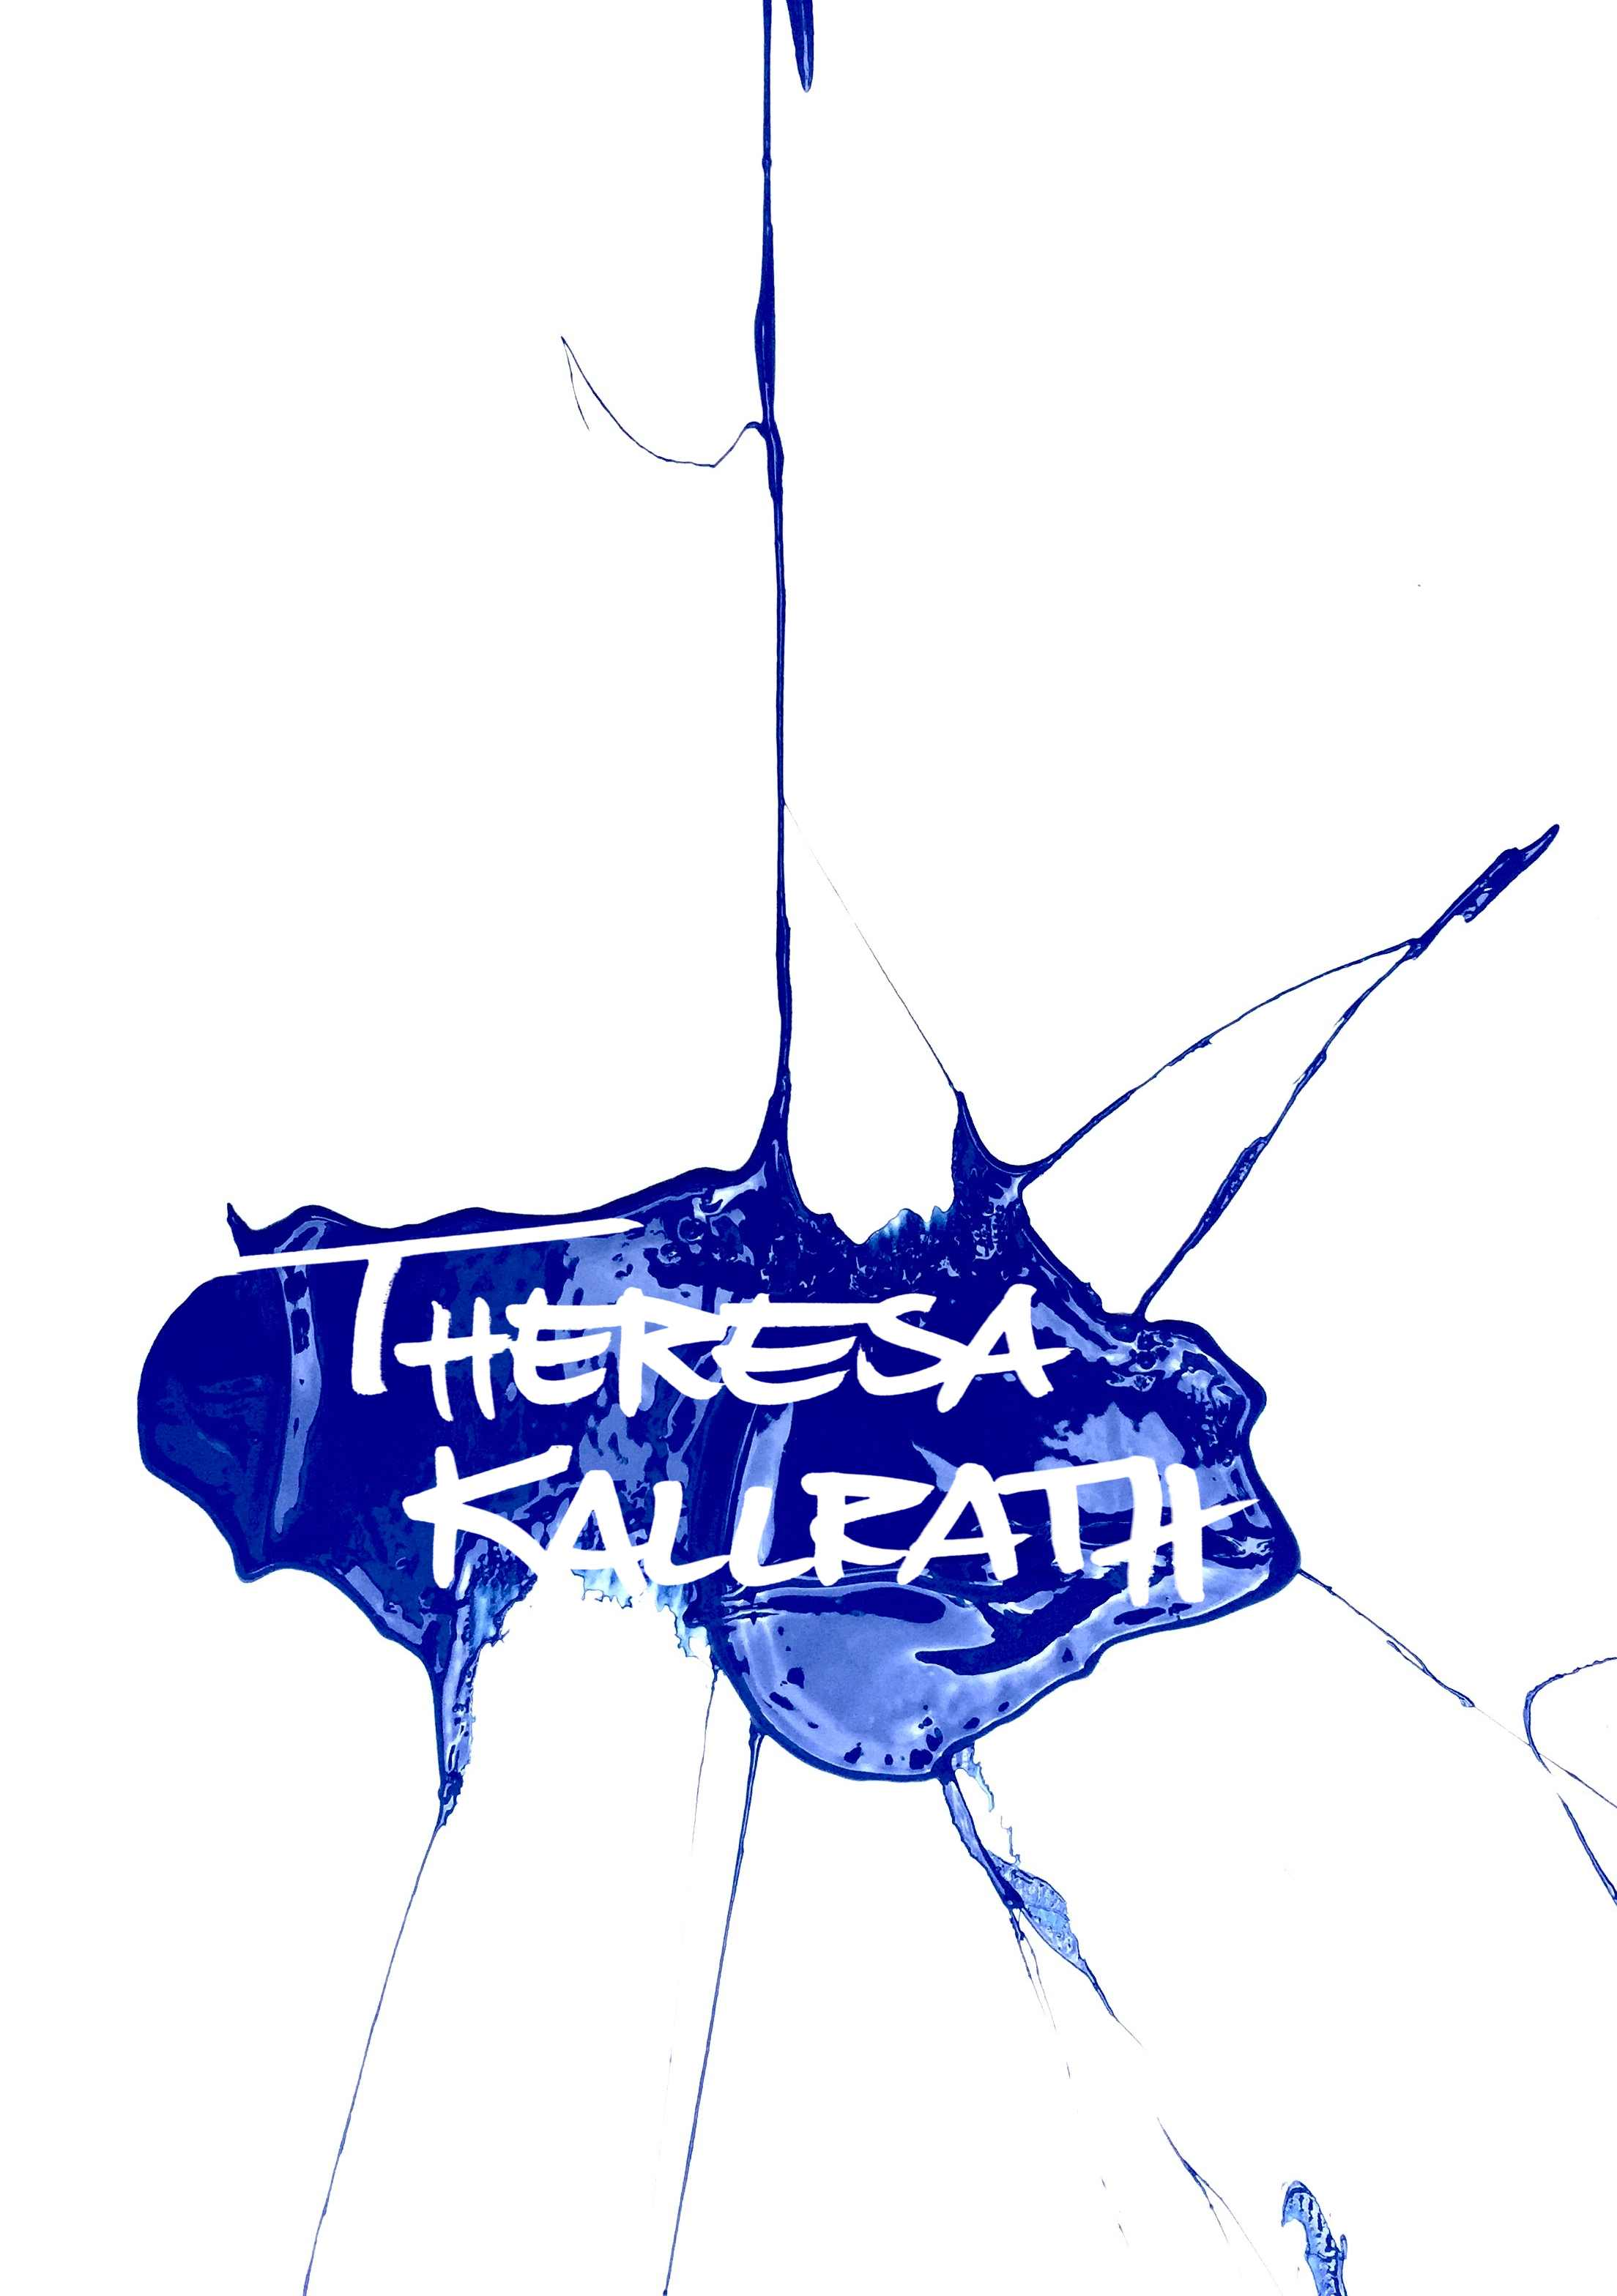 THERESA KALLRATH DÜSSELDORF 2016 ARTIST BLUE SPASH